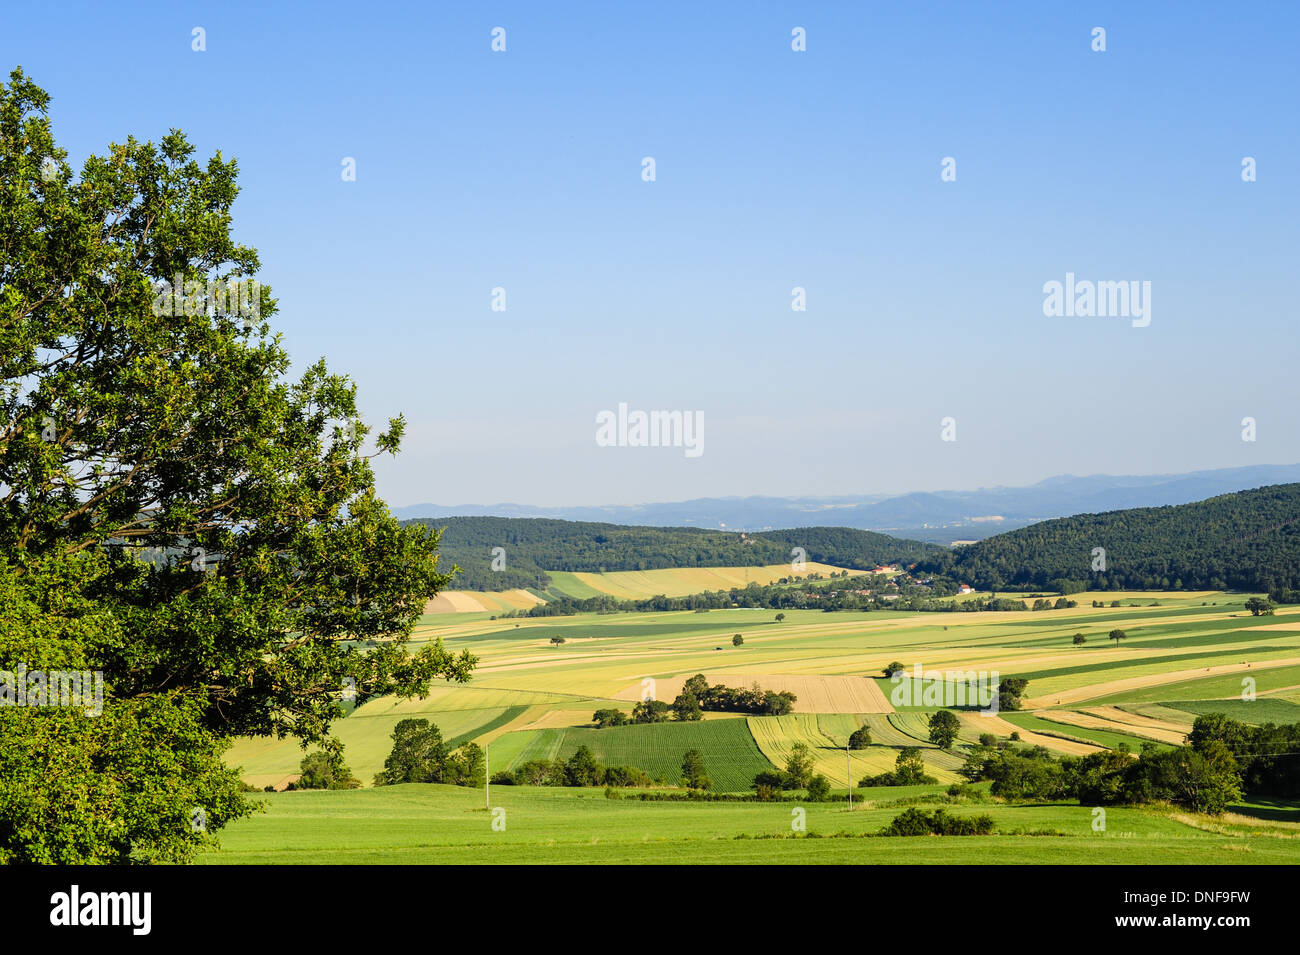 valley Neue Welt, Austria, Lower Austria, Southern Lower Austria, mountain Hohe Wand - Stock Image